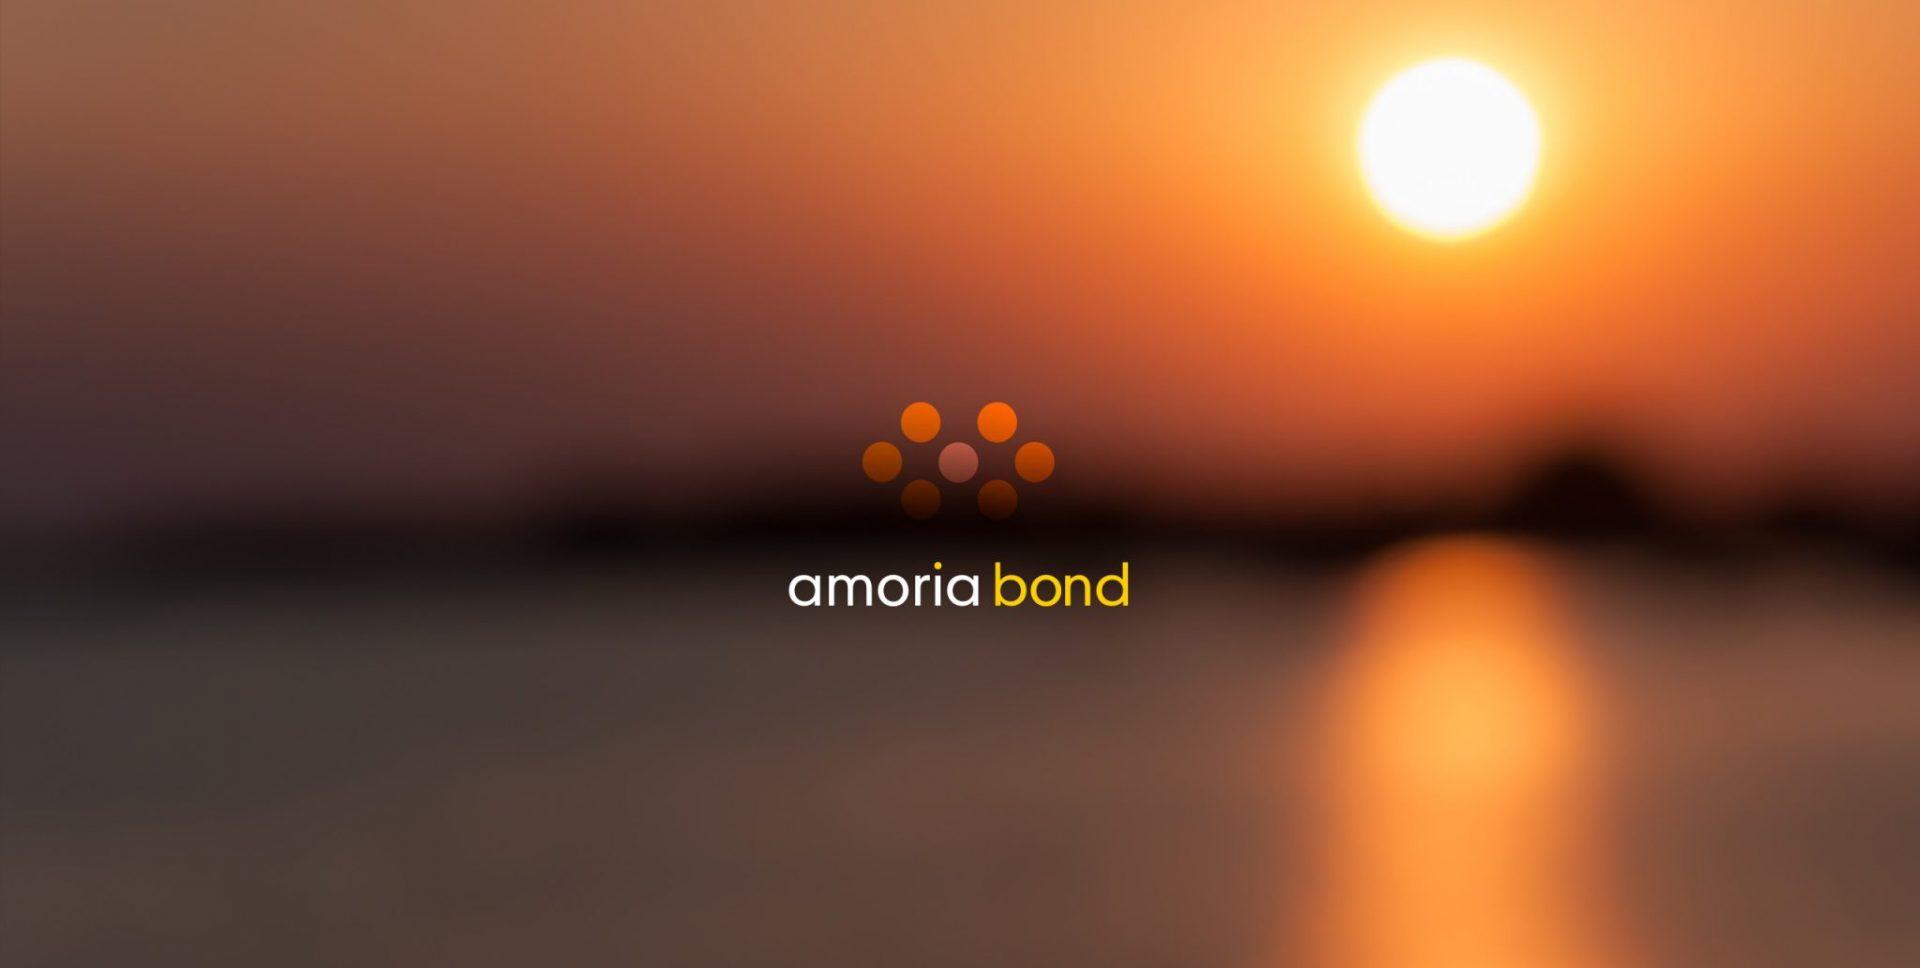 Amoria-bond-header-2560-x-1290